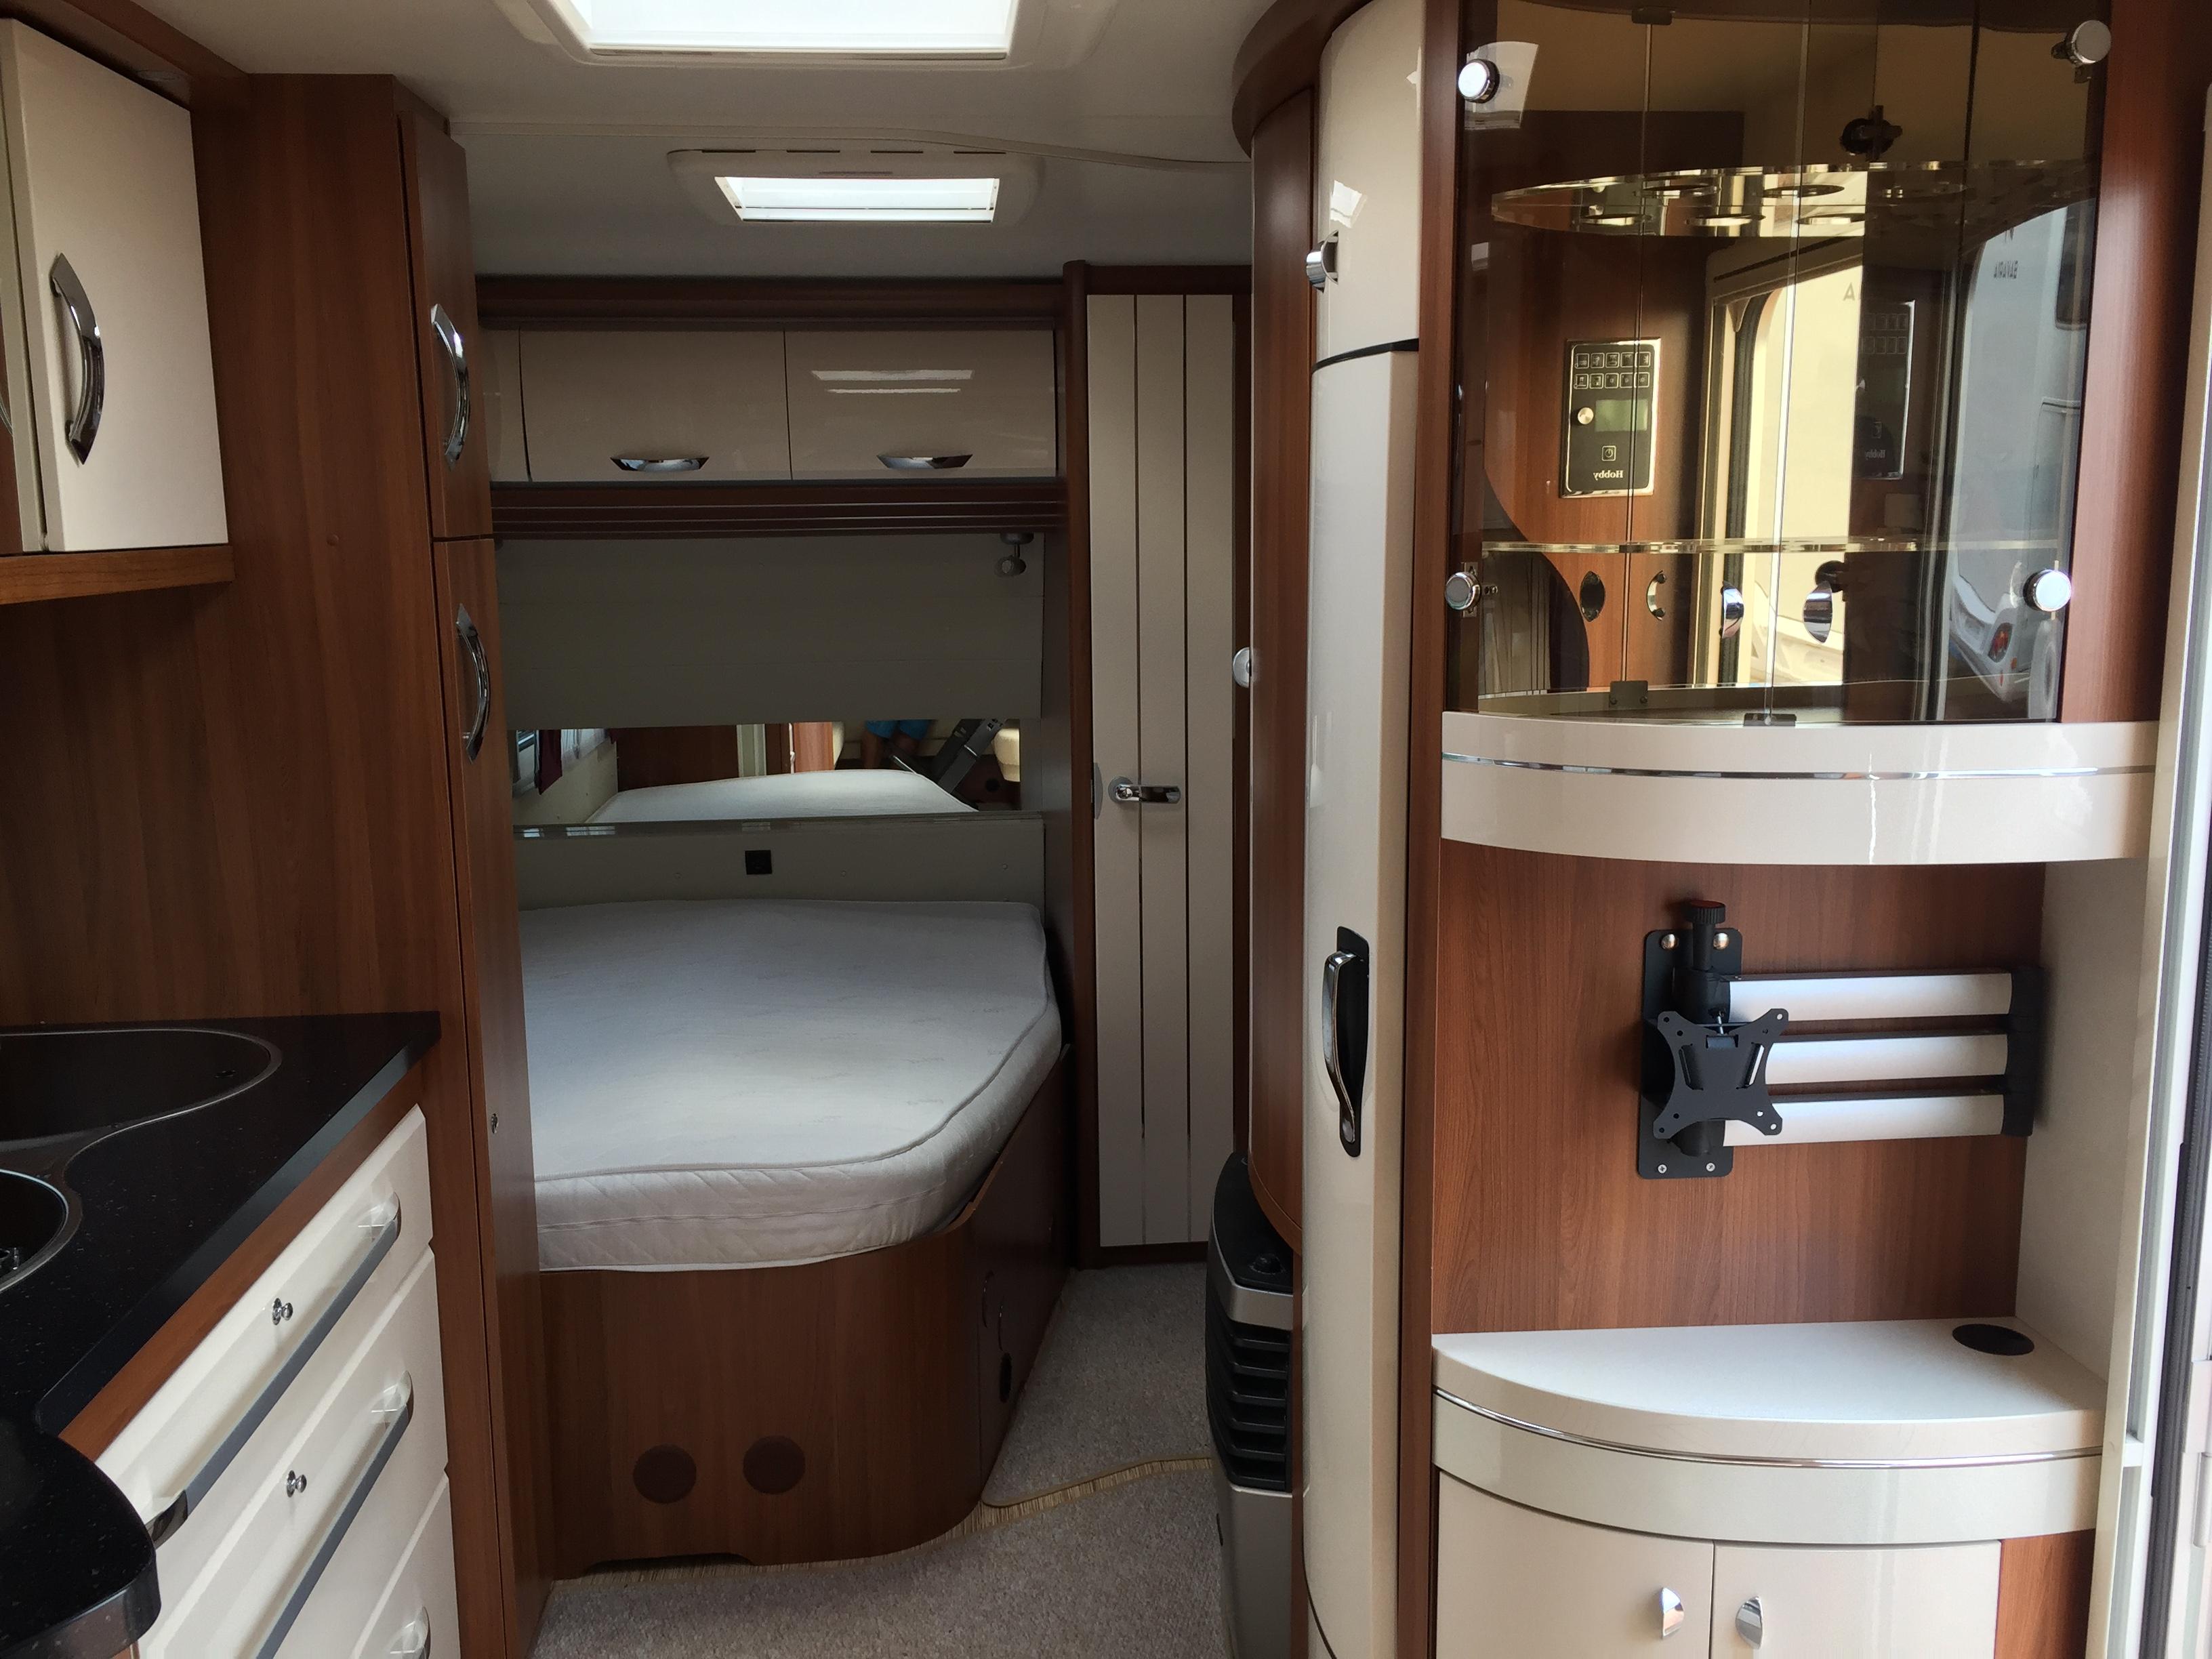 hobby 540 ufe premium occasion de 2014 caravane en vente oberschaeffolsheim rhin 67. Black Bedroom Furniture Sets. Home Design Ideas